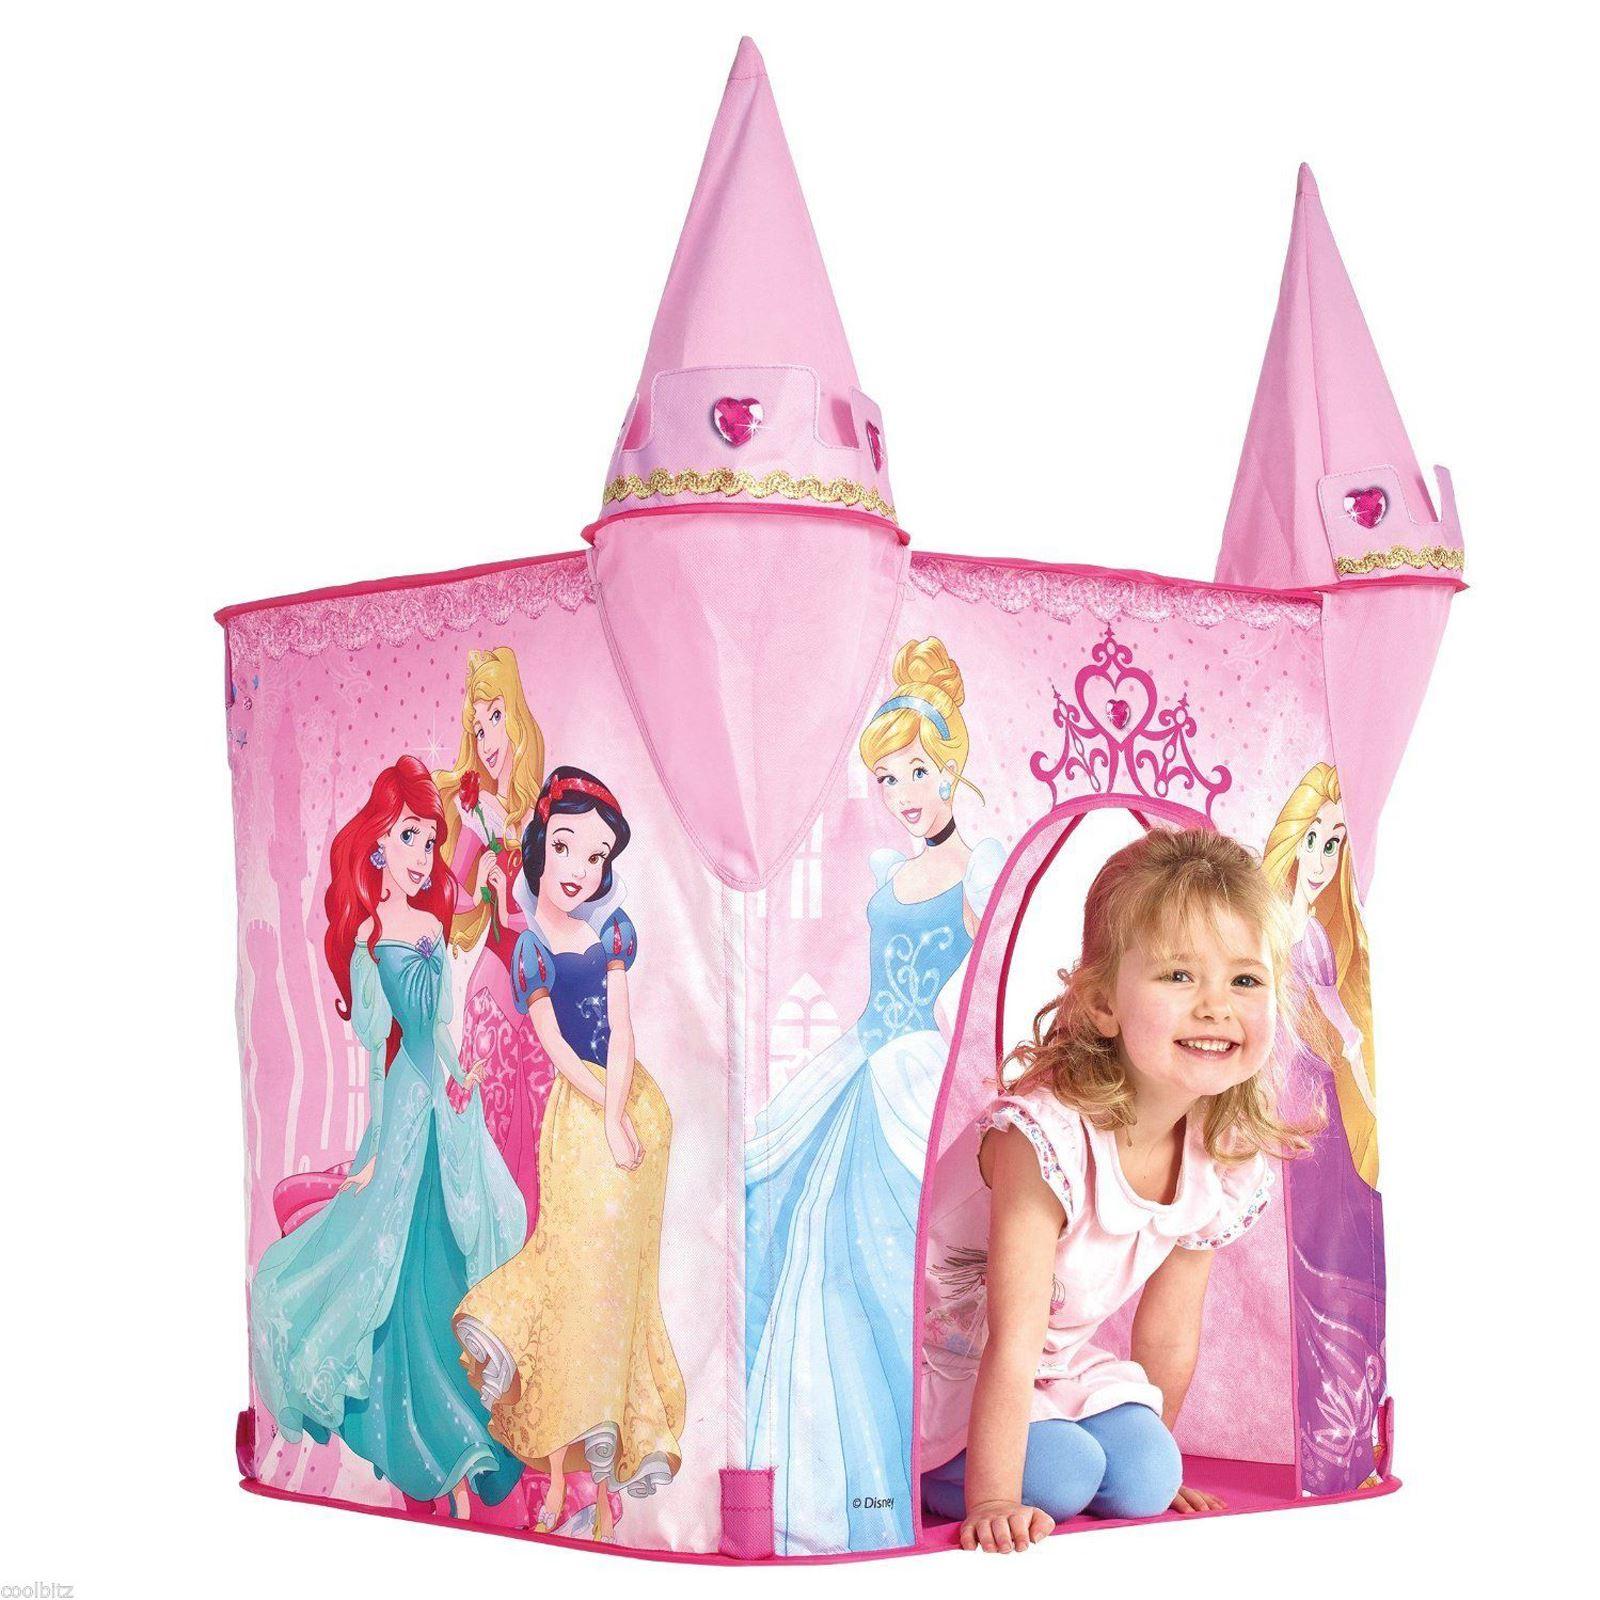 POP-UP-PLAY-TENTS-FEATURE-KIDS-DISNEY-PRINCESS-  sc 1 st  eBay & POP UP PLAY TENTS FEATURE KIDS DISNEY PRINCESS FROZEN CARS ...